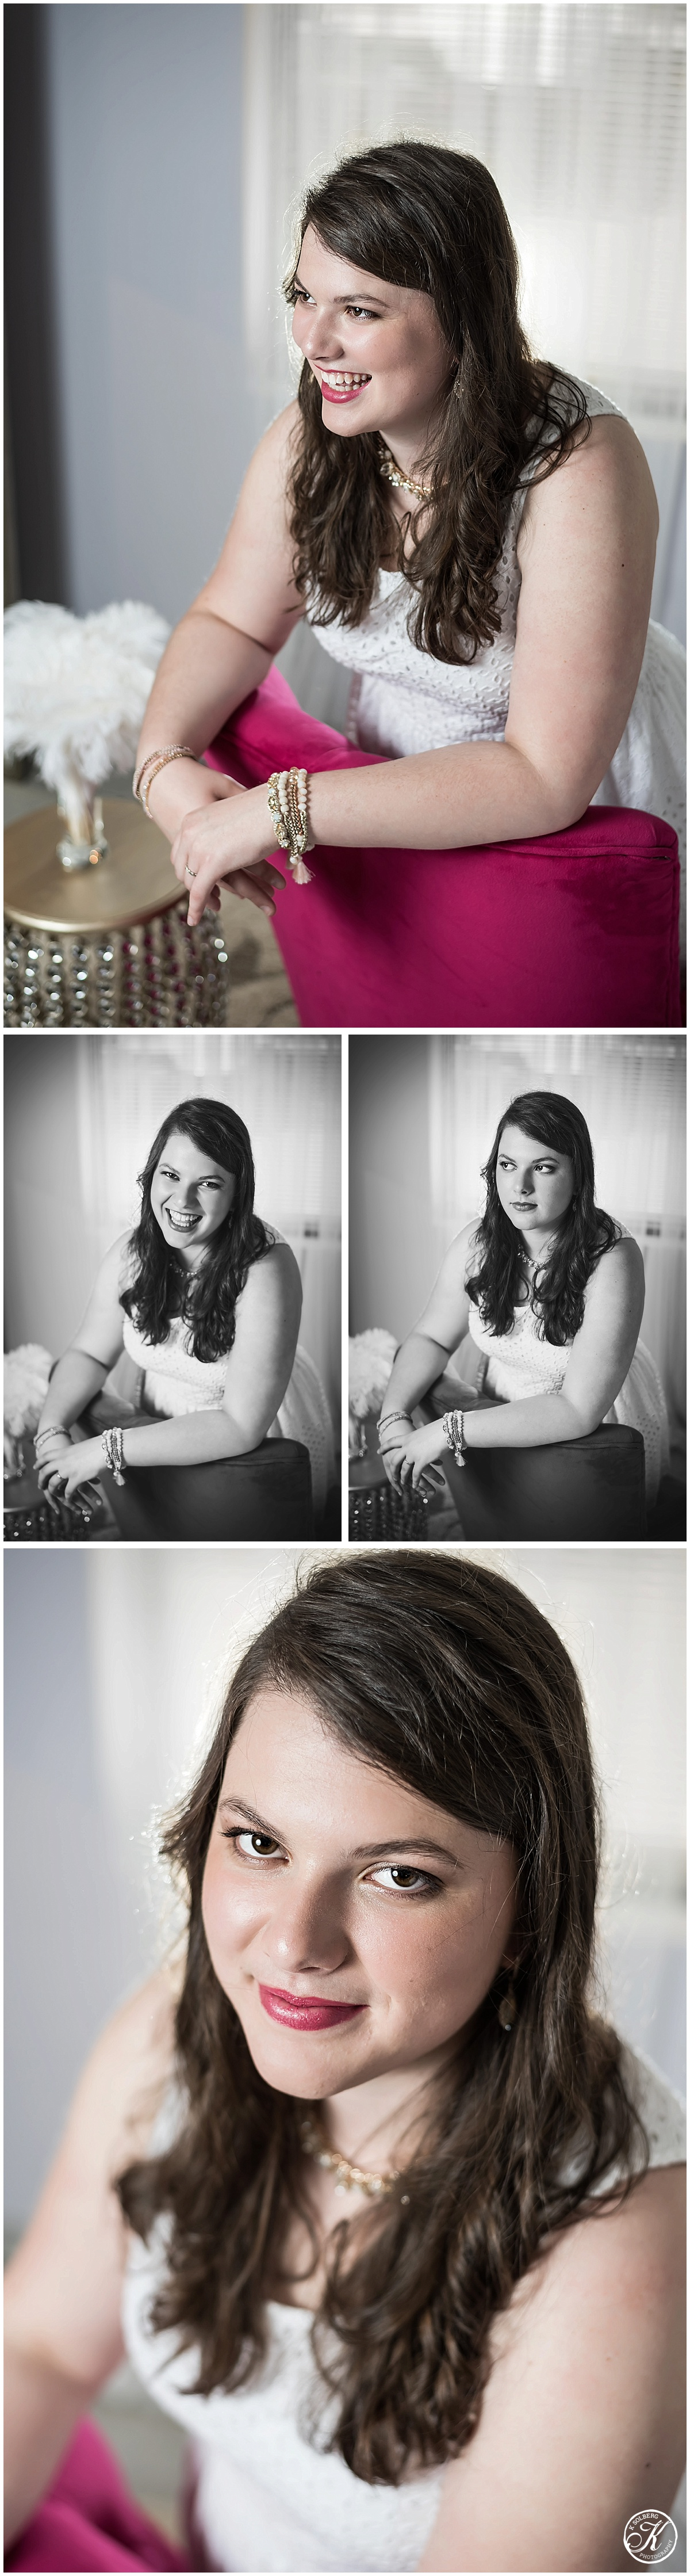 K Solberg Photography Minneapolis Senior Portraits_0022.jpg